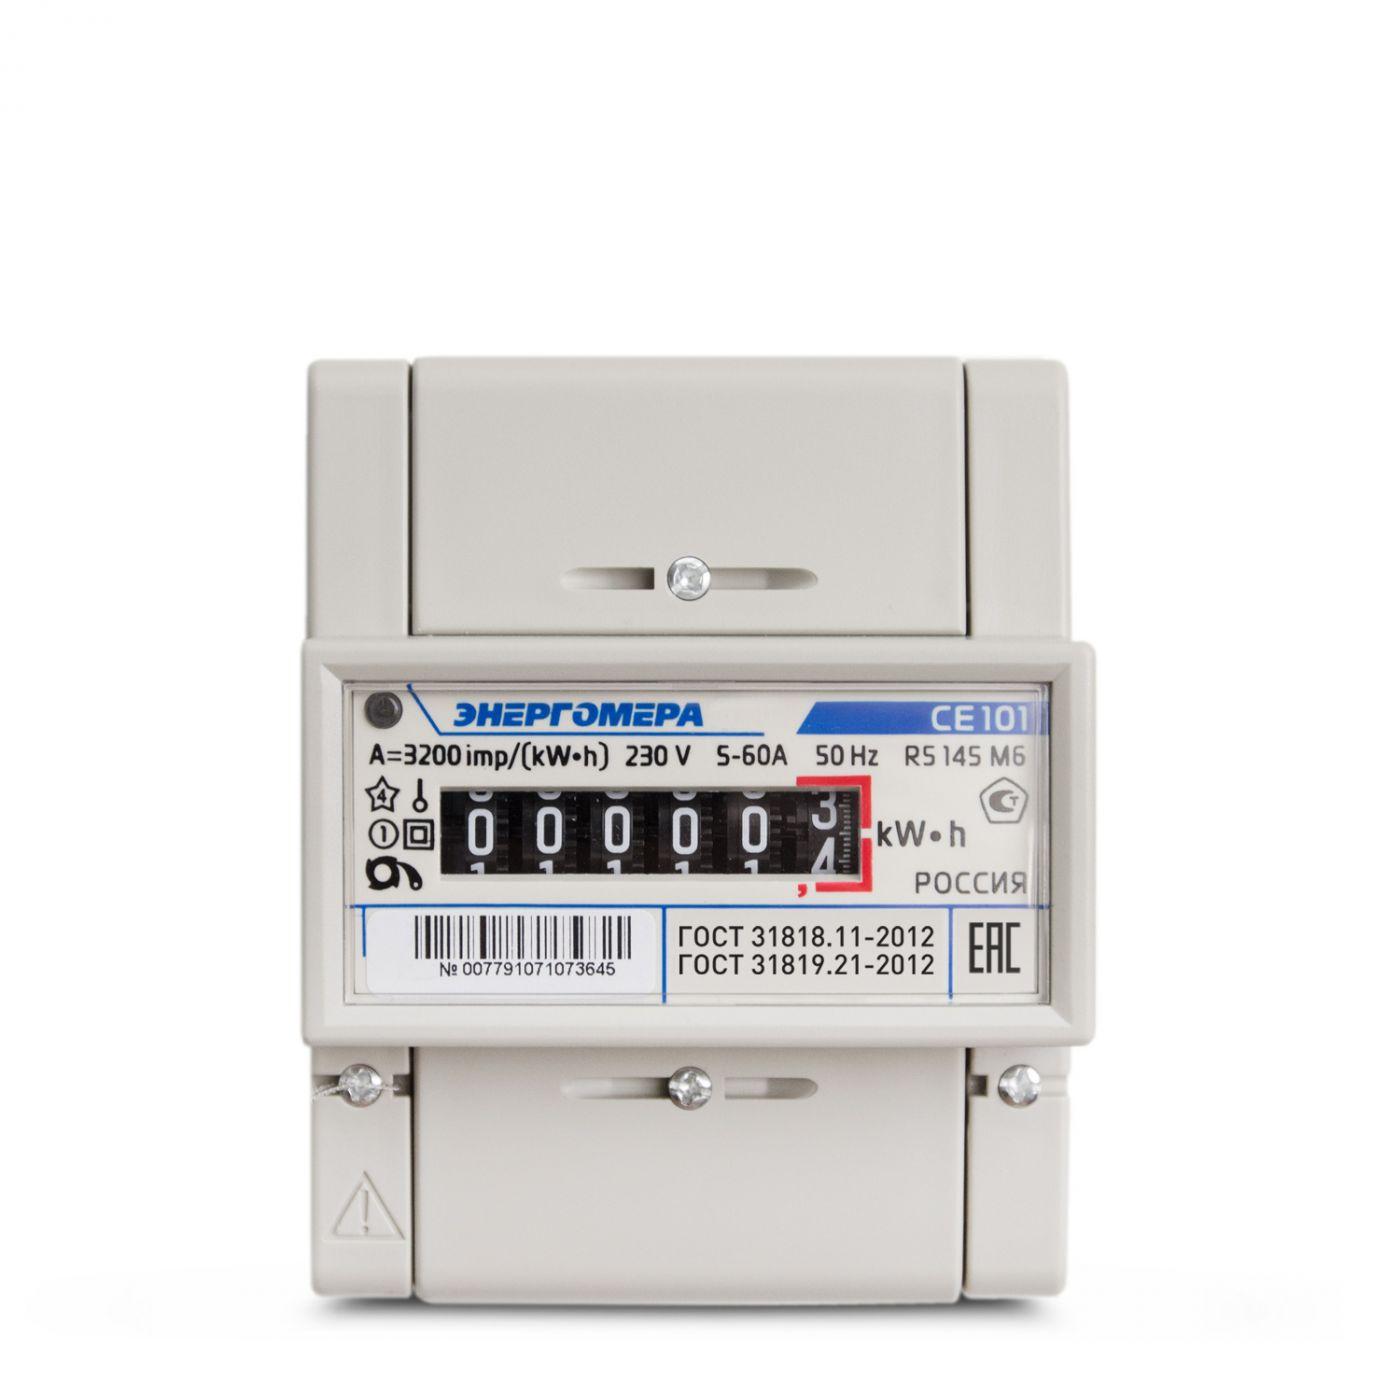 Счетчик электроэнергии однофазный  CE101-R5 145 М6